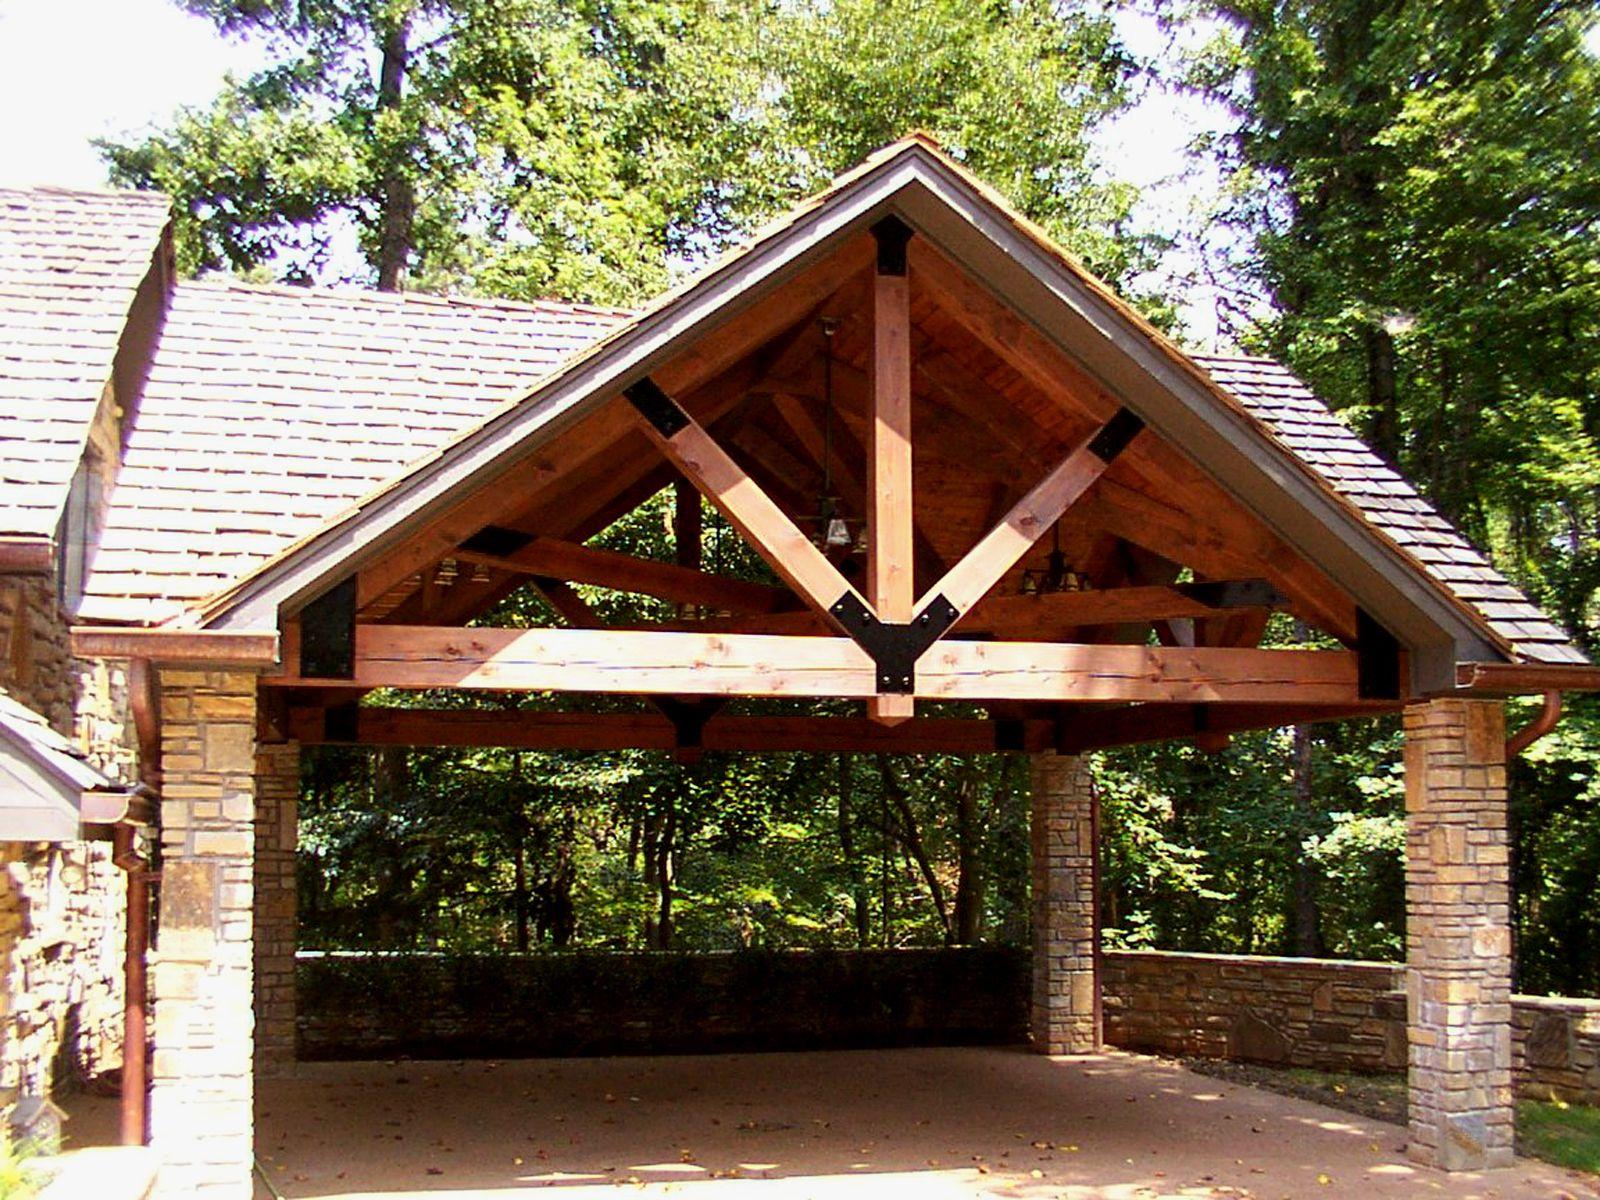 Timber framed carport home sweet home pinterest for Timber frame carport plans